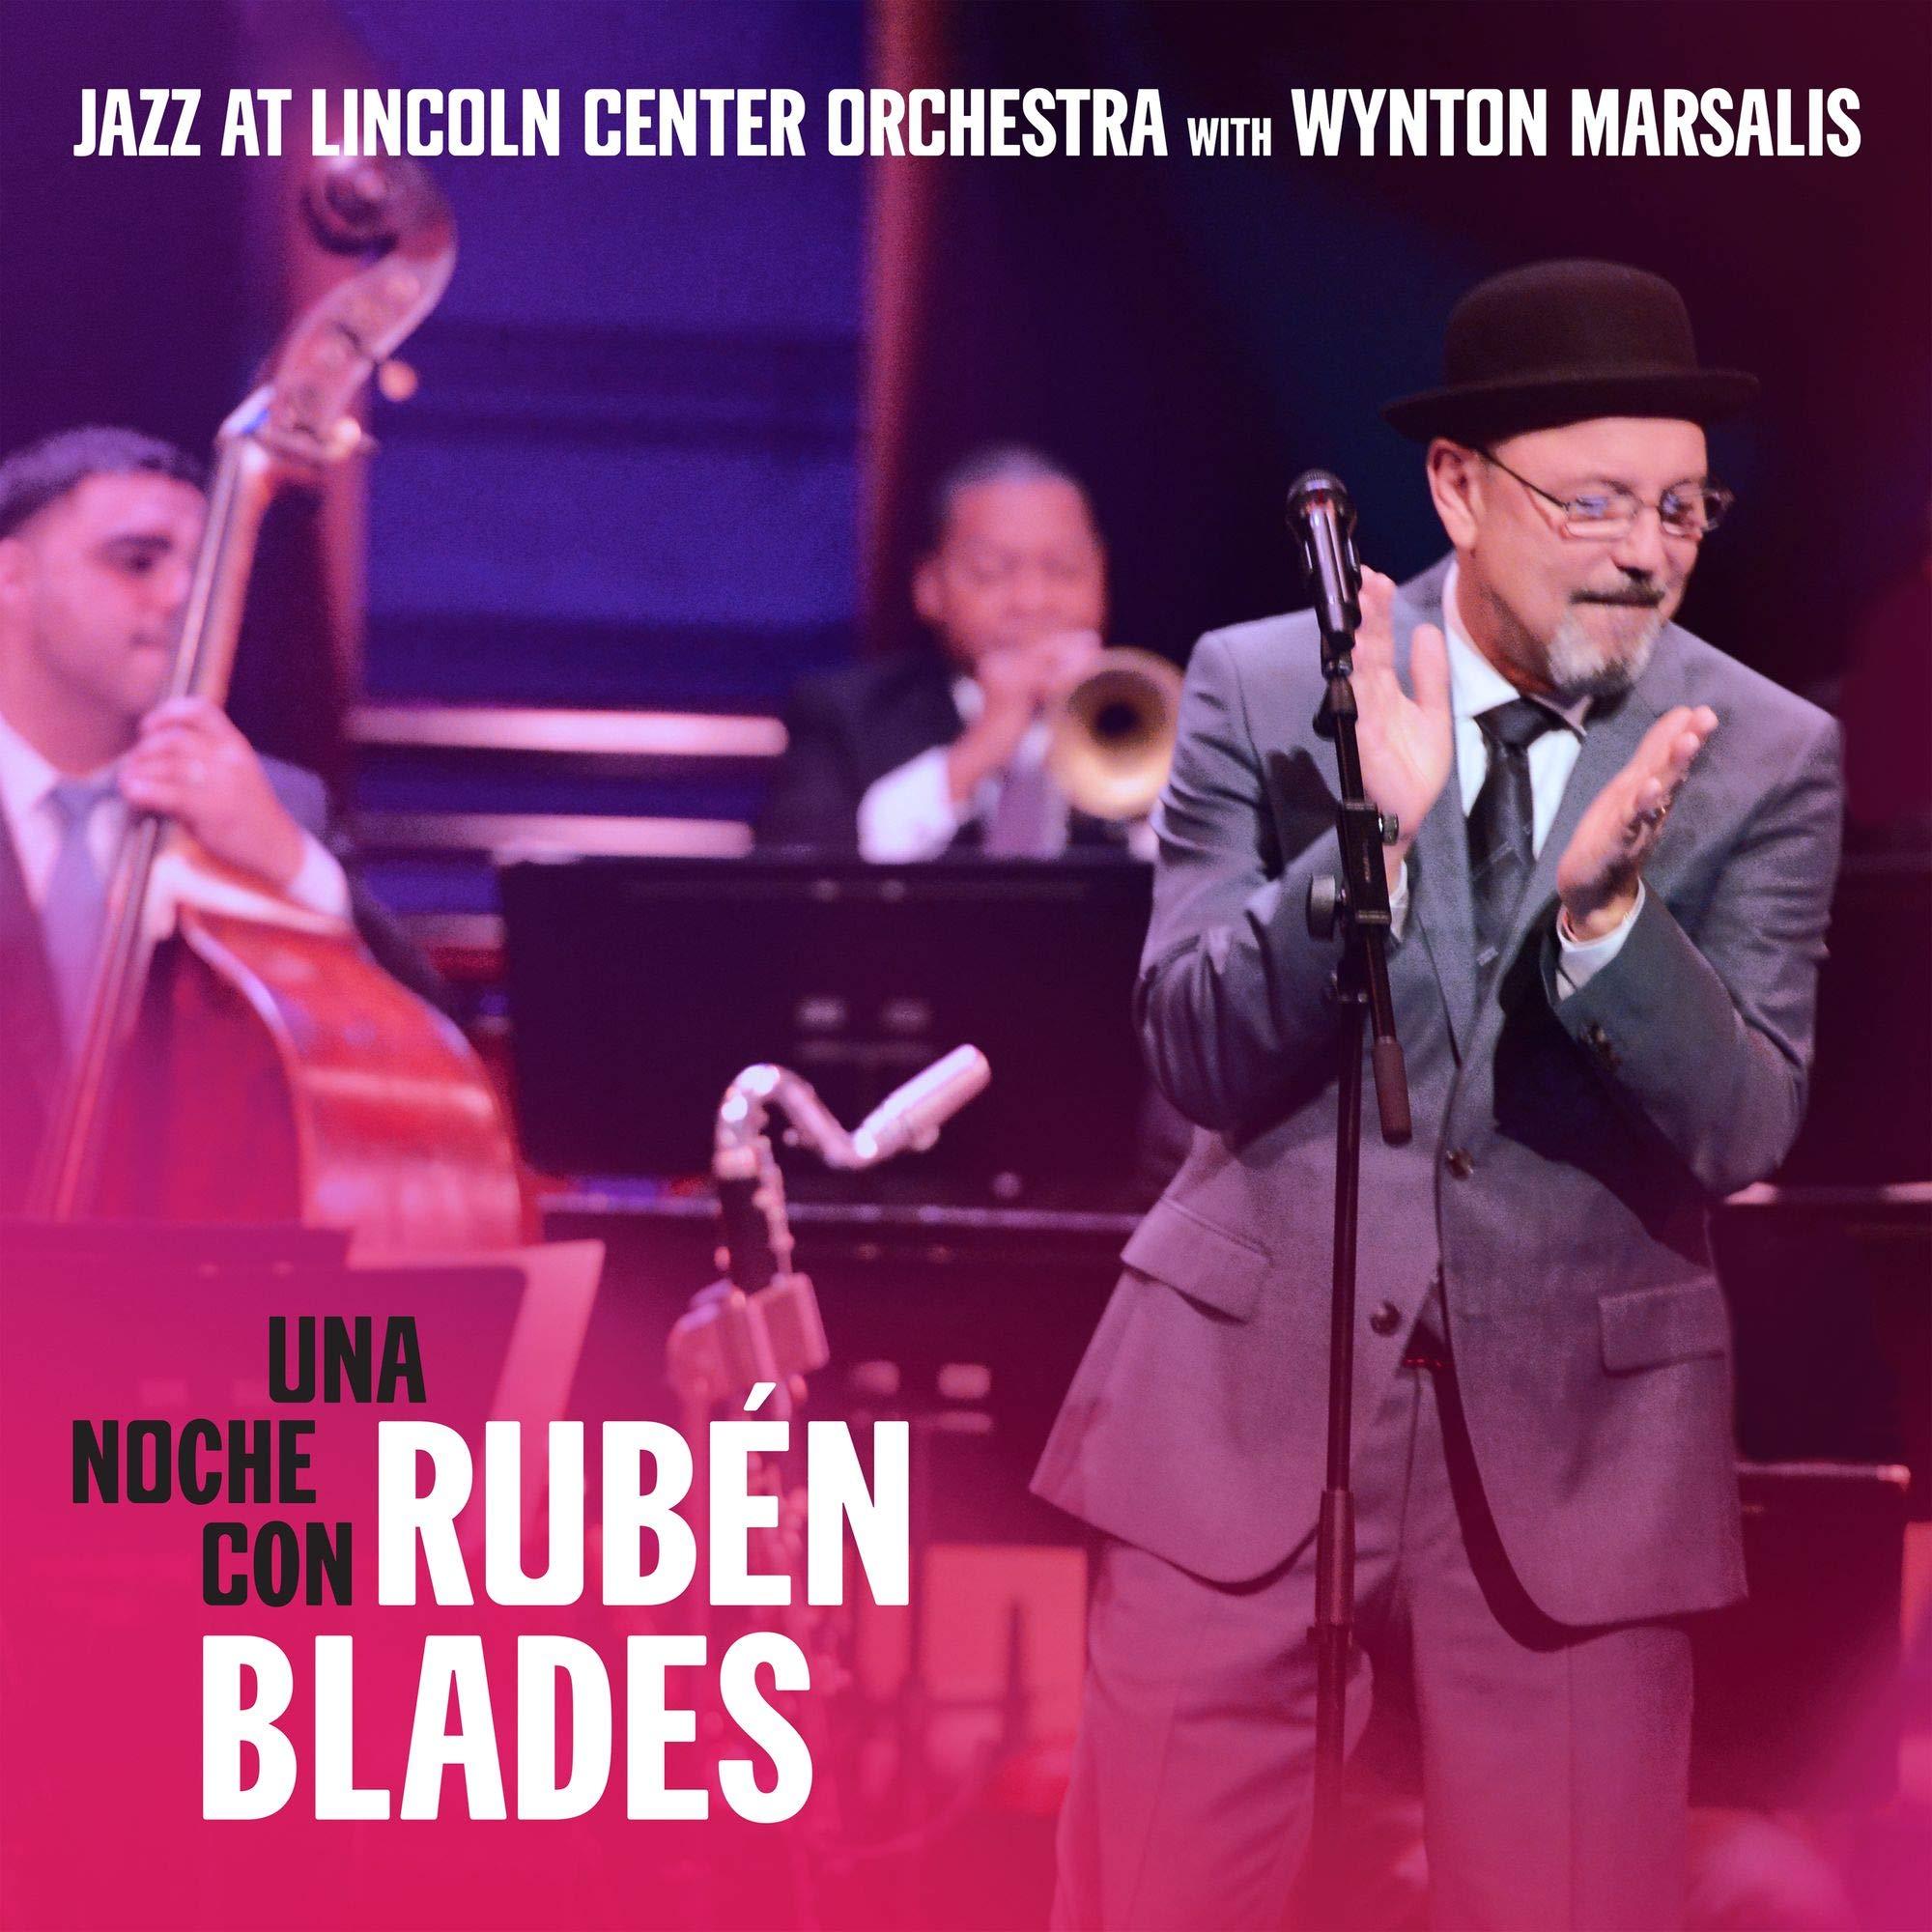 CD : JAZZ AT LINCOLN CENTER ORCHESTRA WITH WYNTON MARSALIS FEATURING RUBEN BLADES - Una Noche Con Ruben Blades (CD)